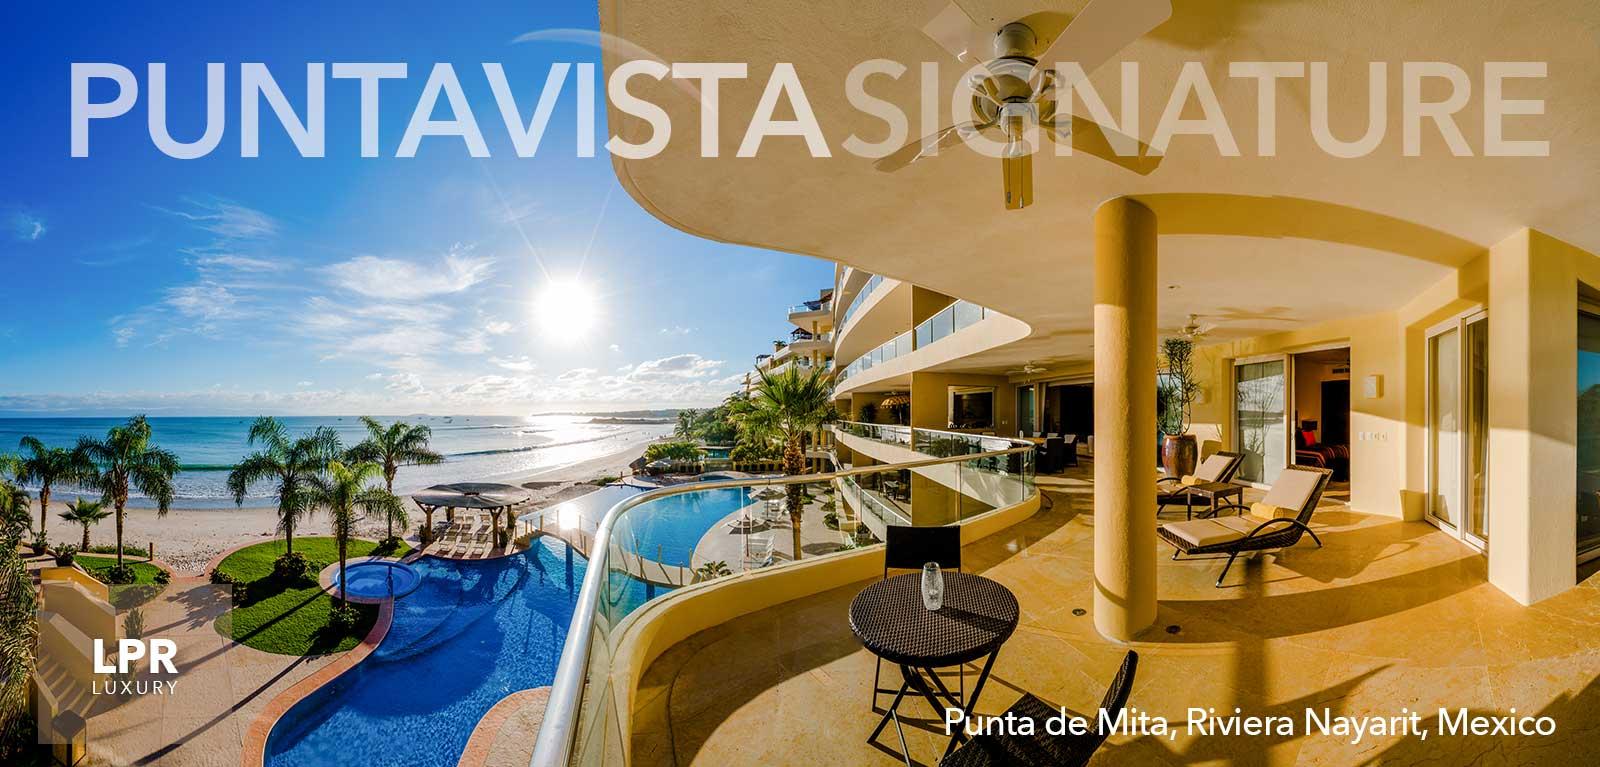 Punta Vista Signature Residences - Playa Punta Mita, Riviera Nayarit, Mexico